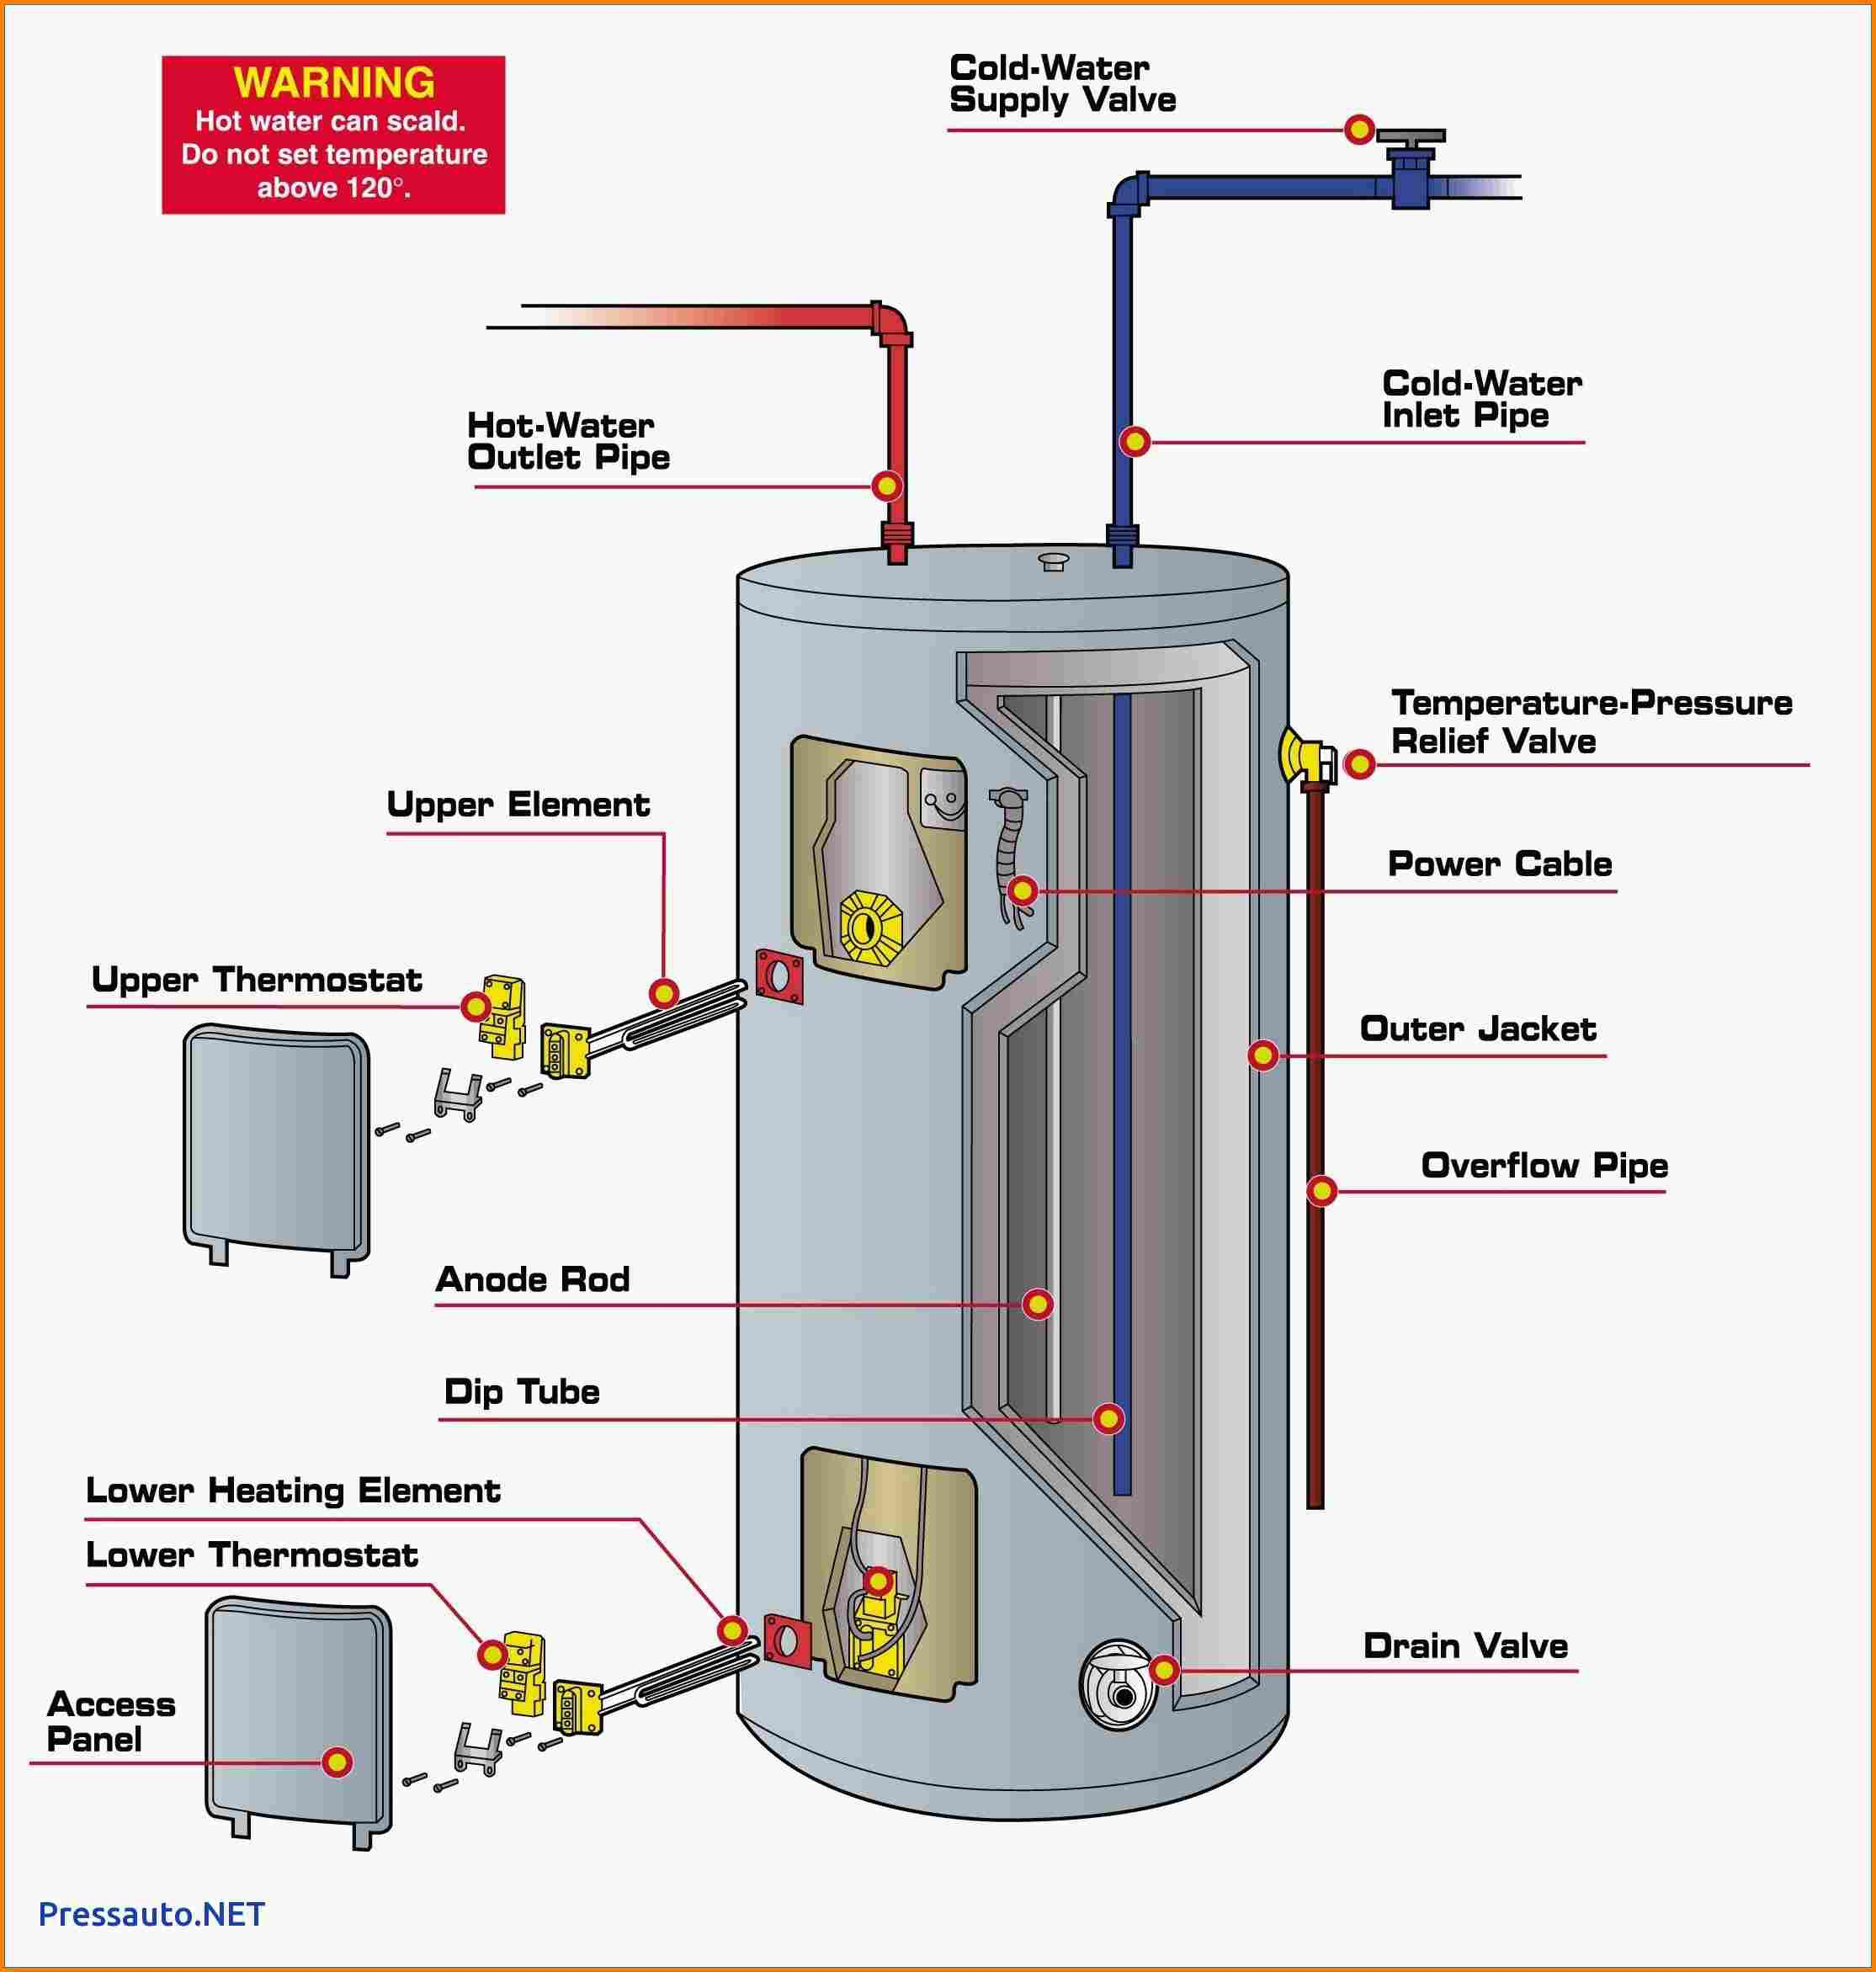 Wiring Diagram For Hot Water Heater Element Kenwood Car Stereo Wiring Harness Diagram File Detail Vww 69 Yenpancane Jeanjaures37 Fr